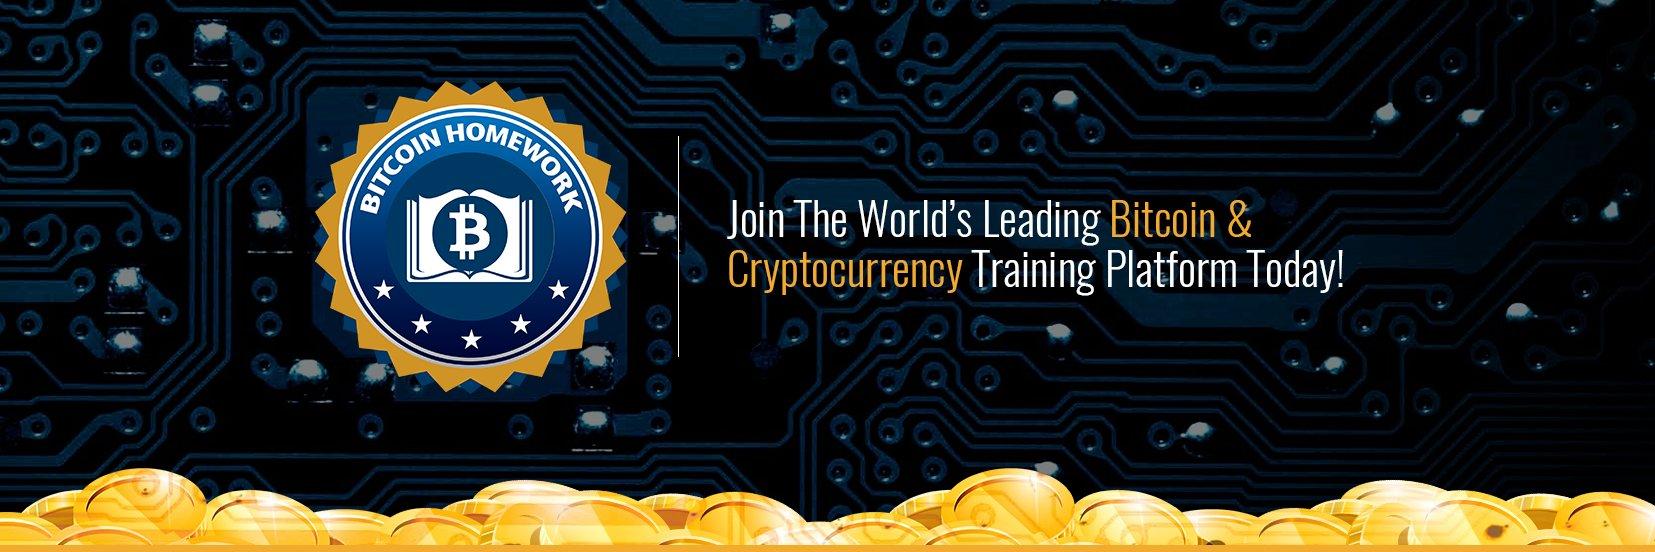 #BitcoinHomework #ExtraCredit $Xtra #Xtra #ICO #Presale 8 DAYS AWAY! huffingtonpost.com/entry/the-very… @Huffington… https://t.co/Ut0YhOiWvA